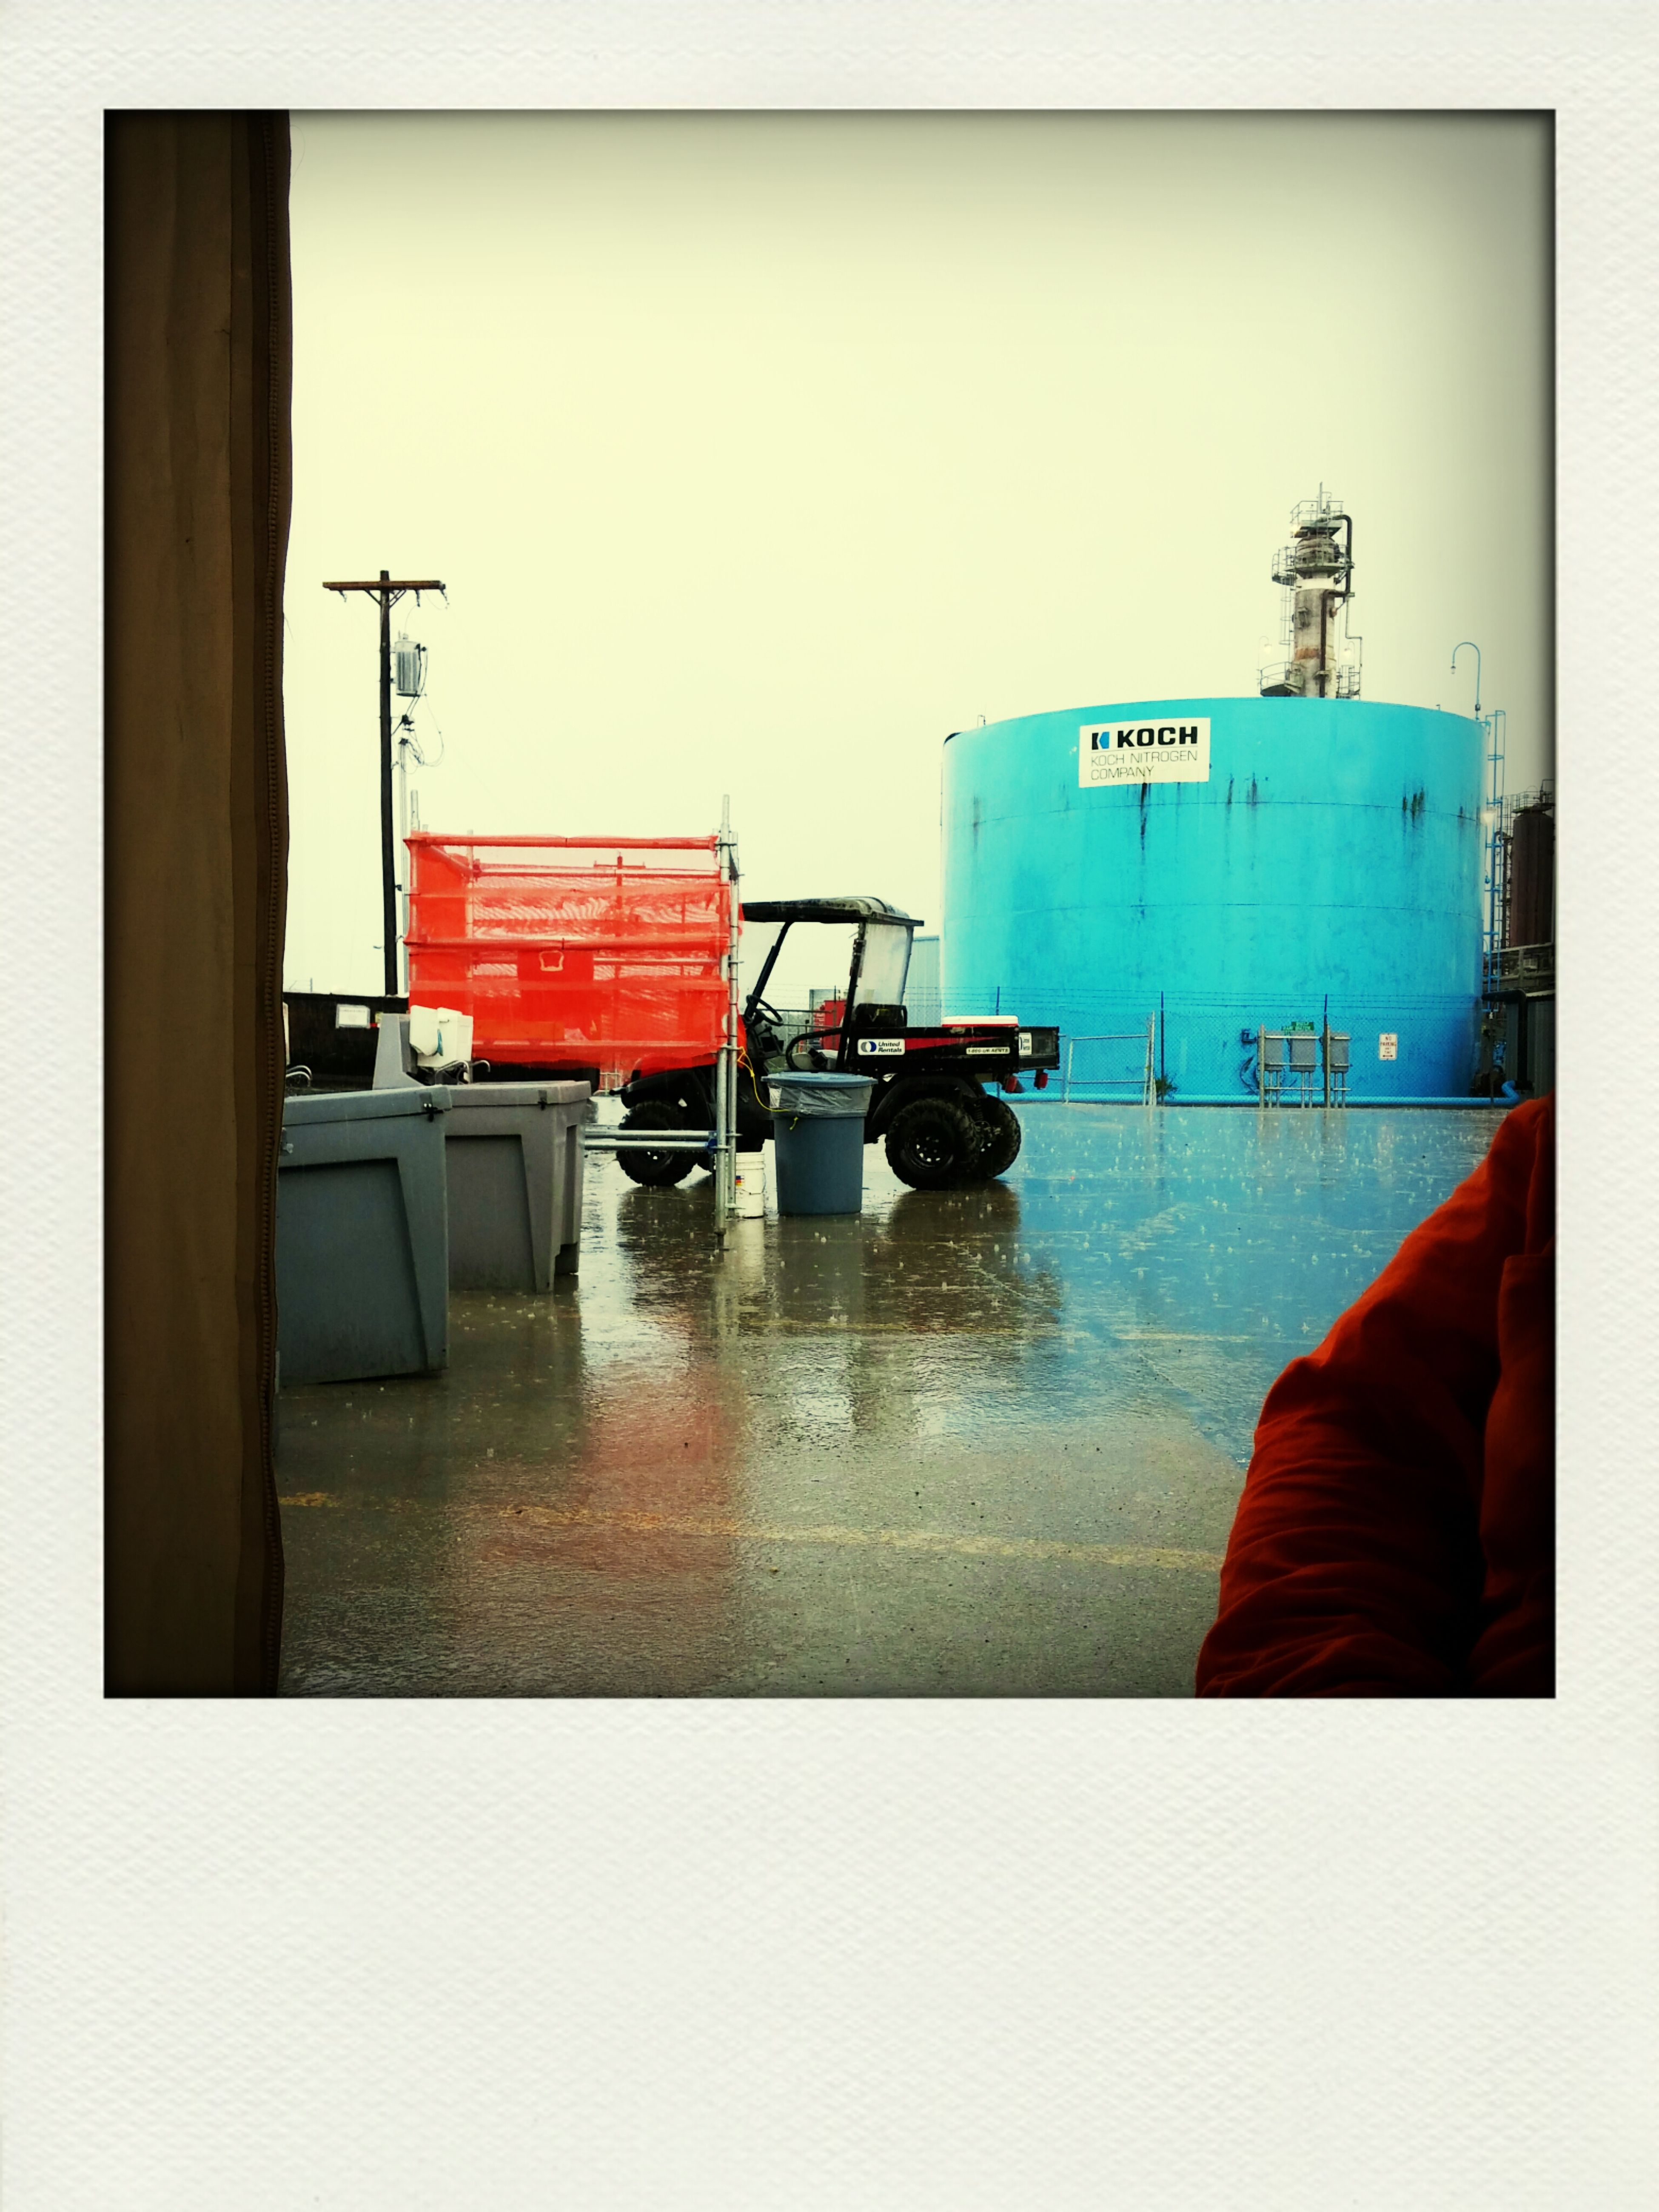 Rainy Days At The Job First Eyeem Photo